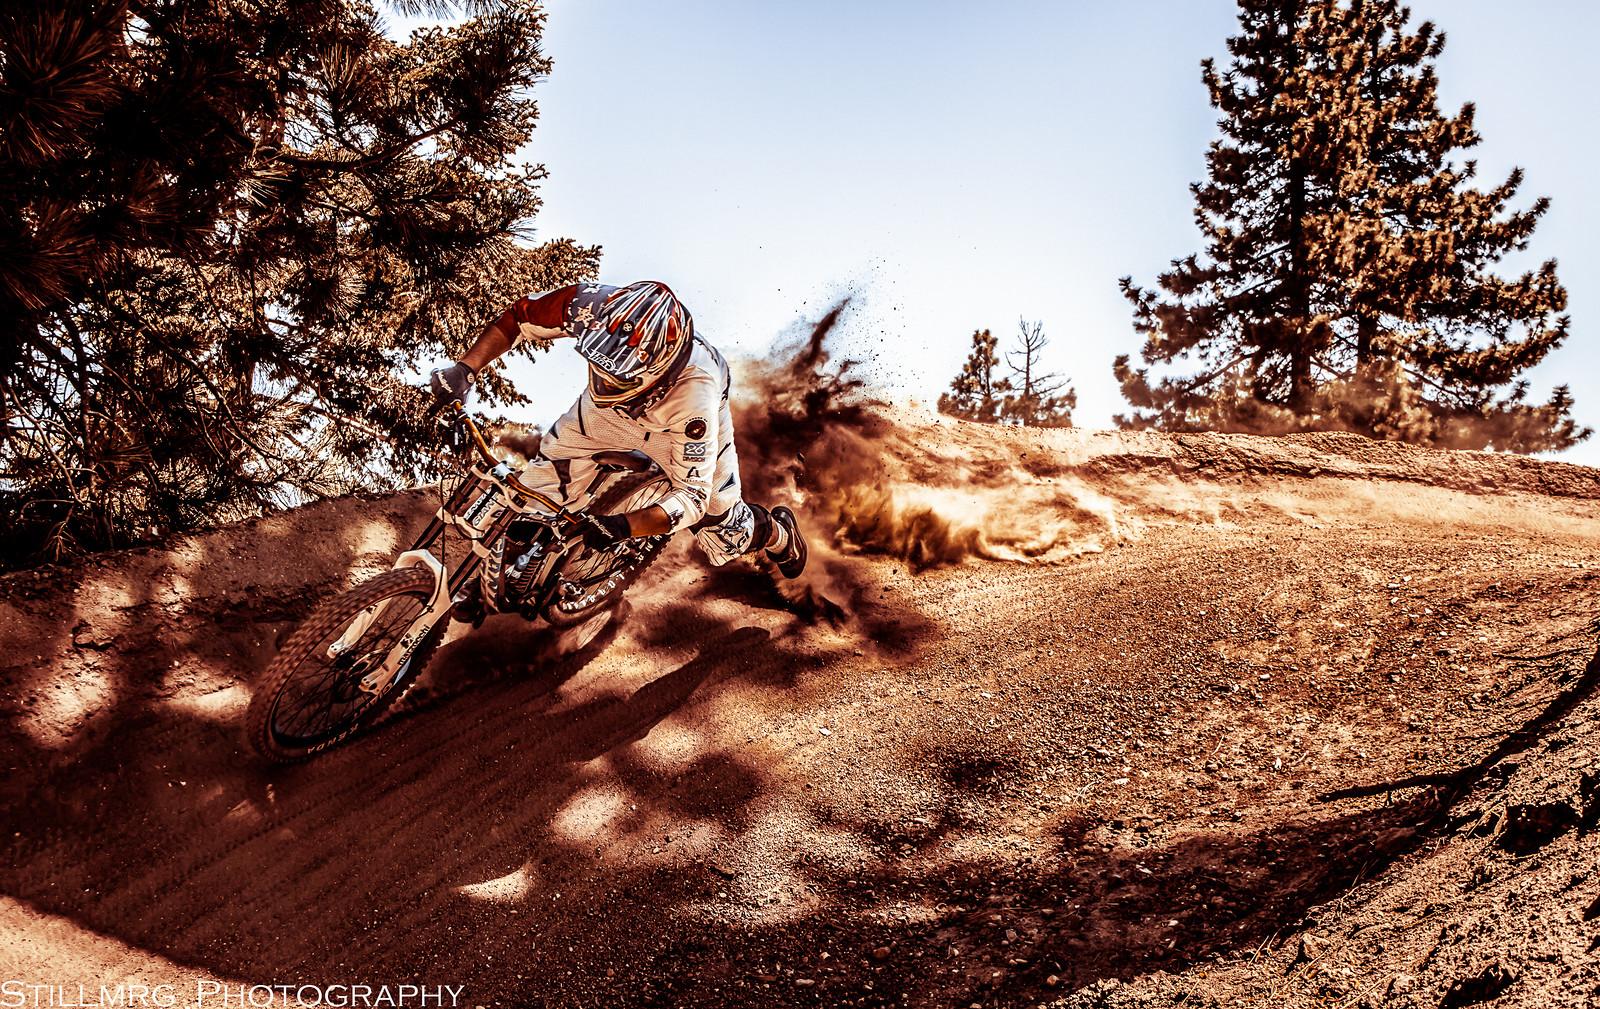 Snow Summit - Stillmrg Photography - Mountain Biking Pictures - Vital MTB